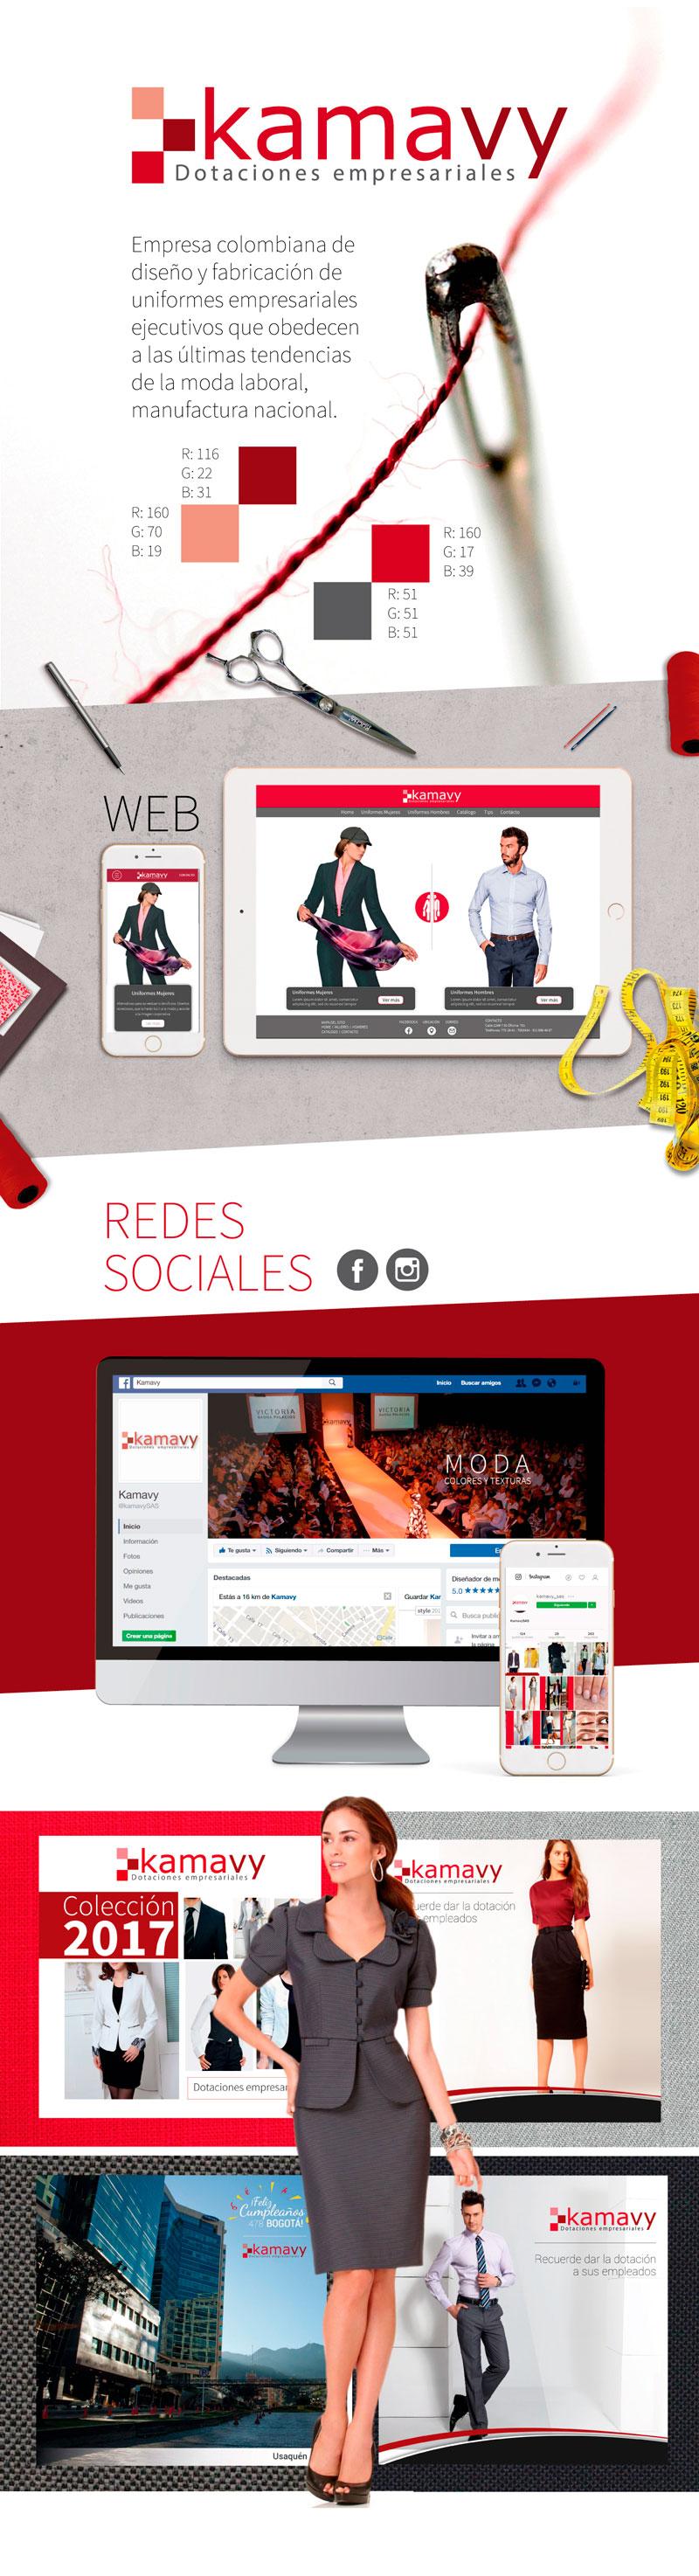 Diseño Web - Social Media - Imagen Corporativa